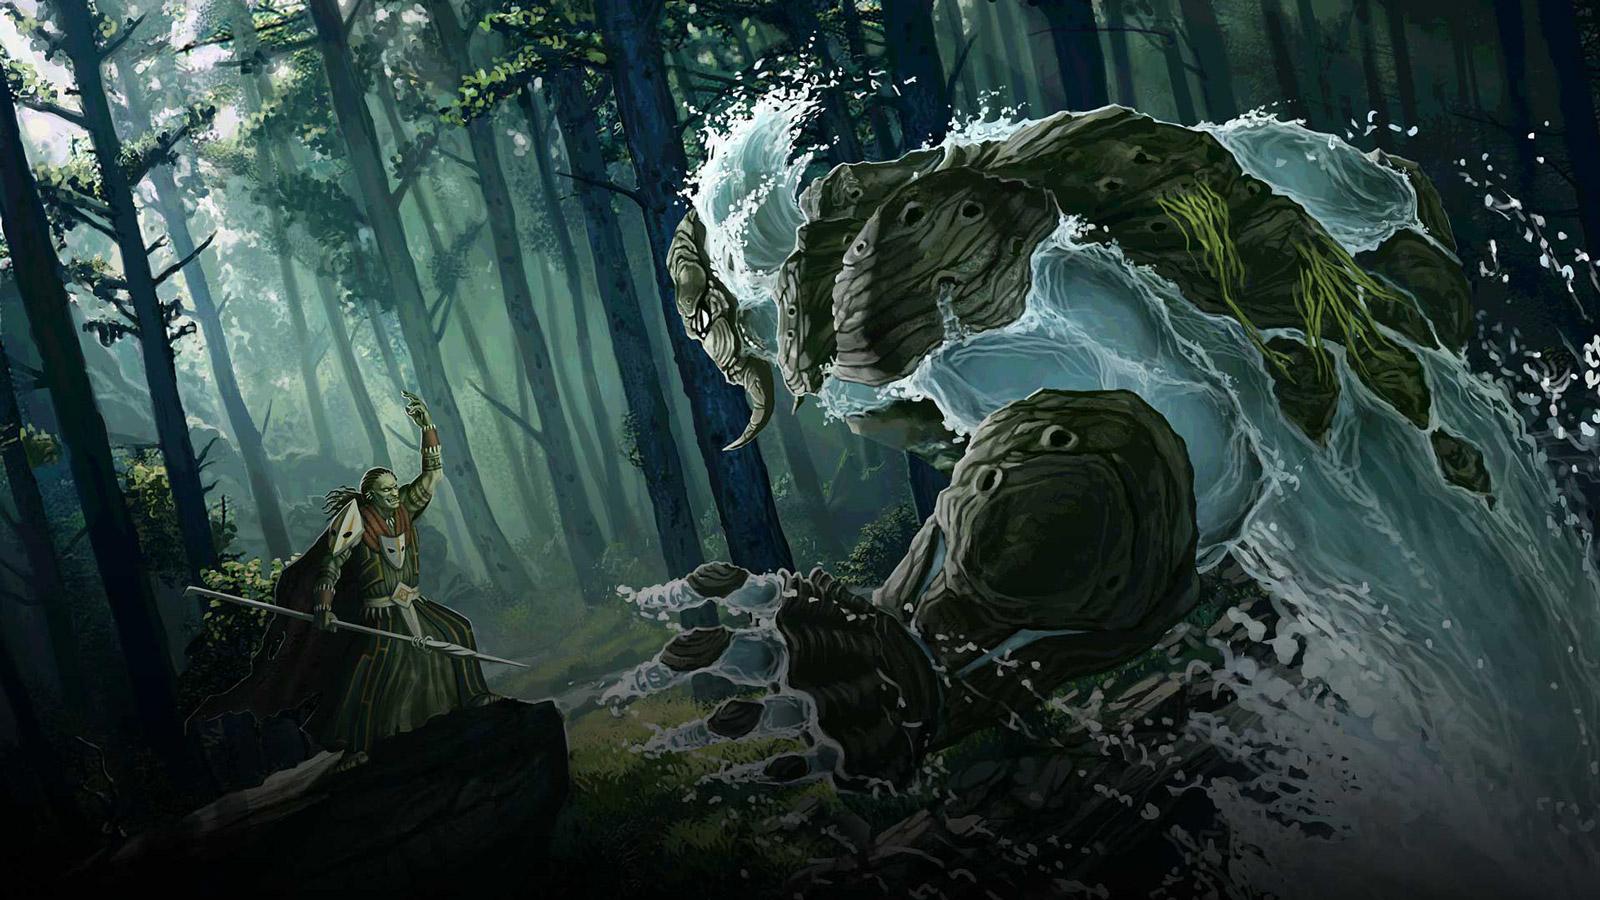 Free Age of Wonders III Wallpaper in 1600x900